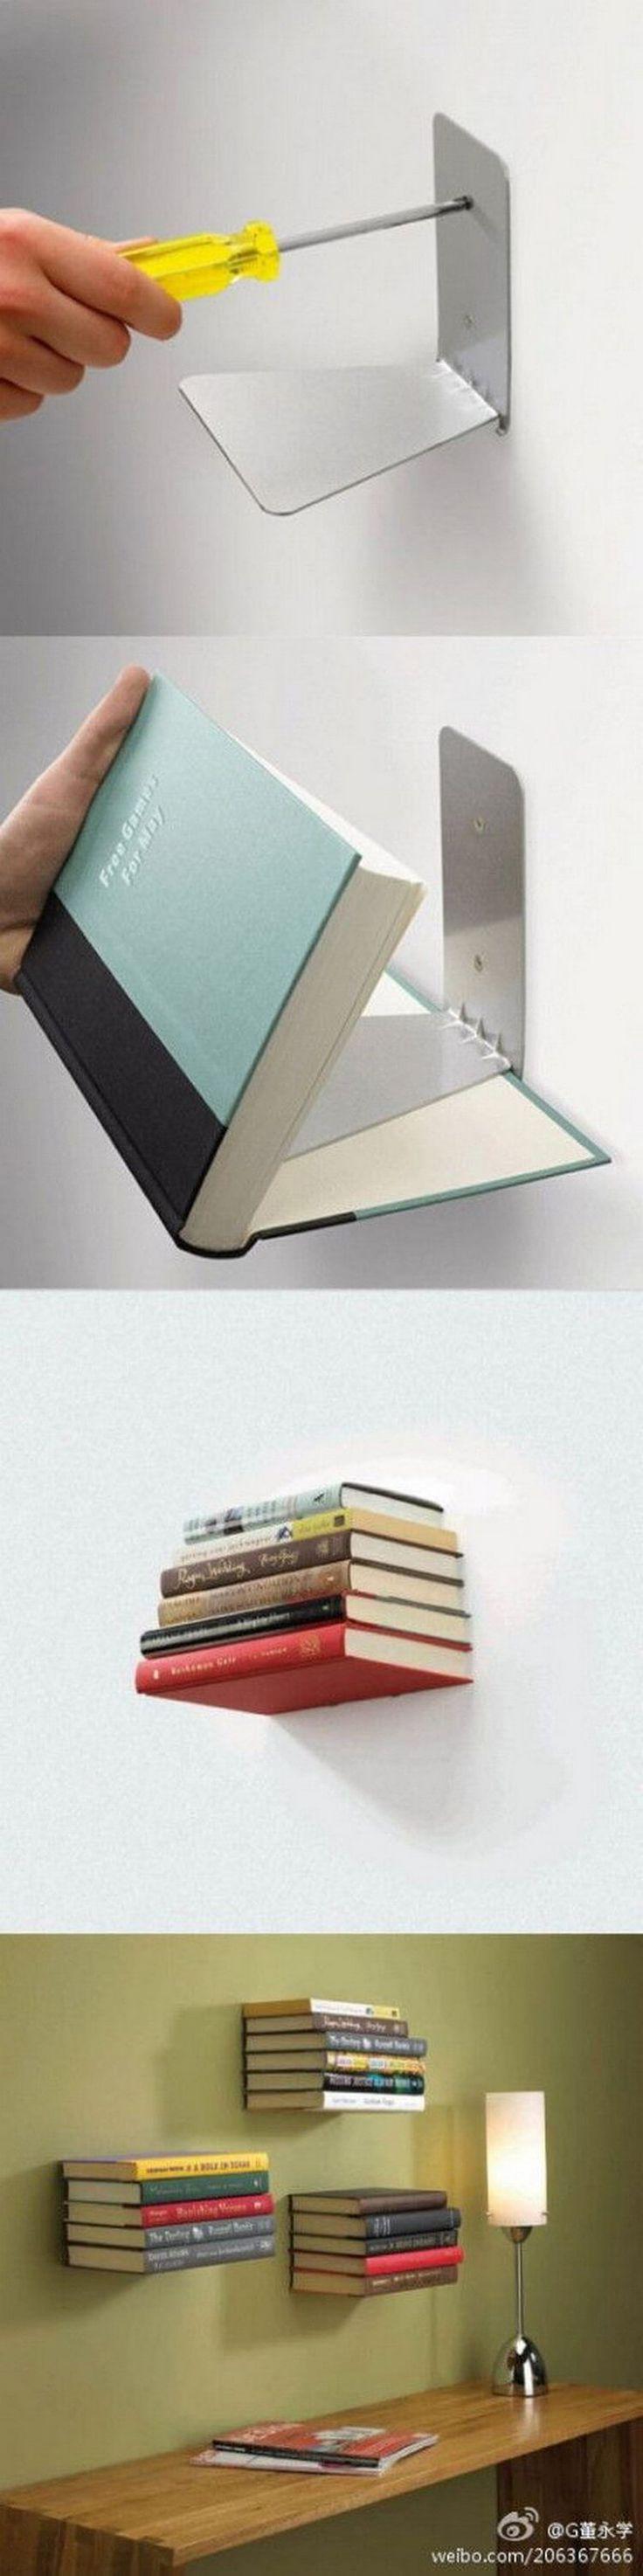 Minimalist Invisible Stacking DIY Bookshelves